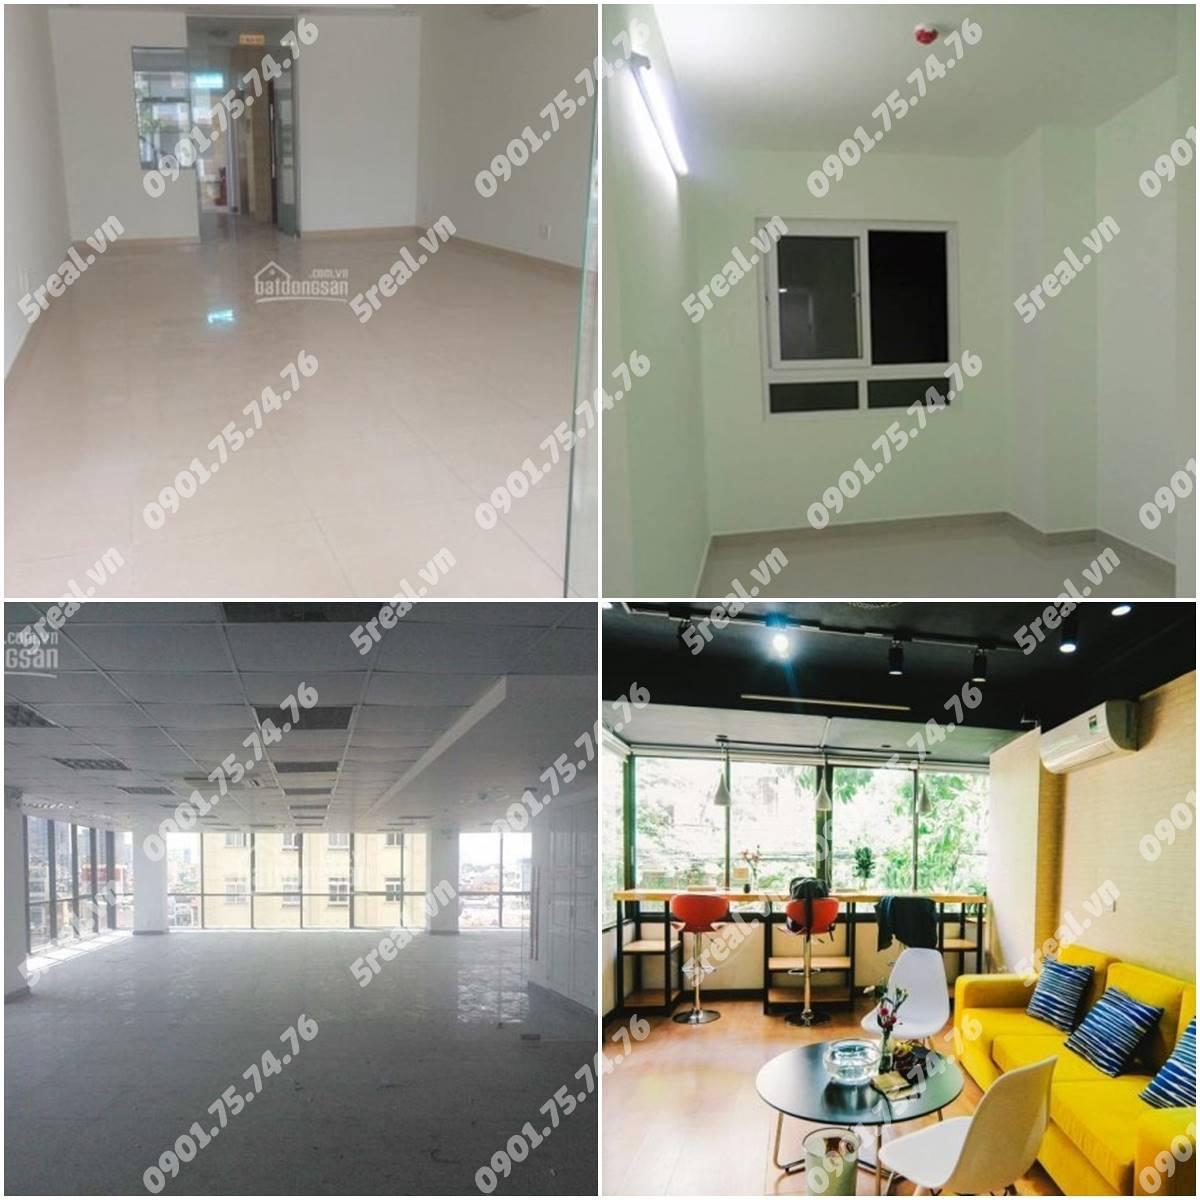 topaz-city-cao-lo-quan-8-van-phong-cho-thue-tphcm-5real.vn-05